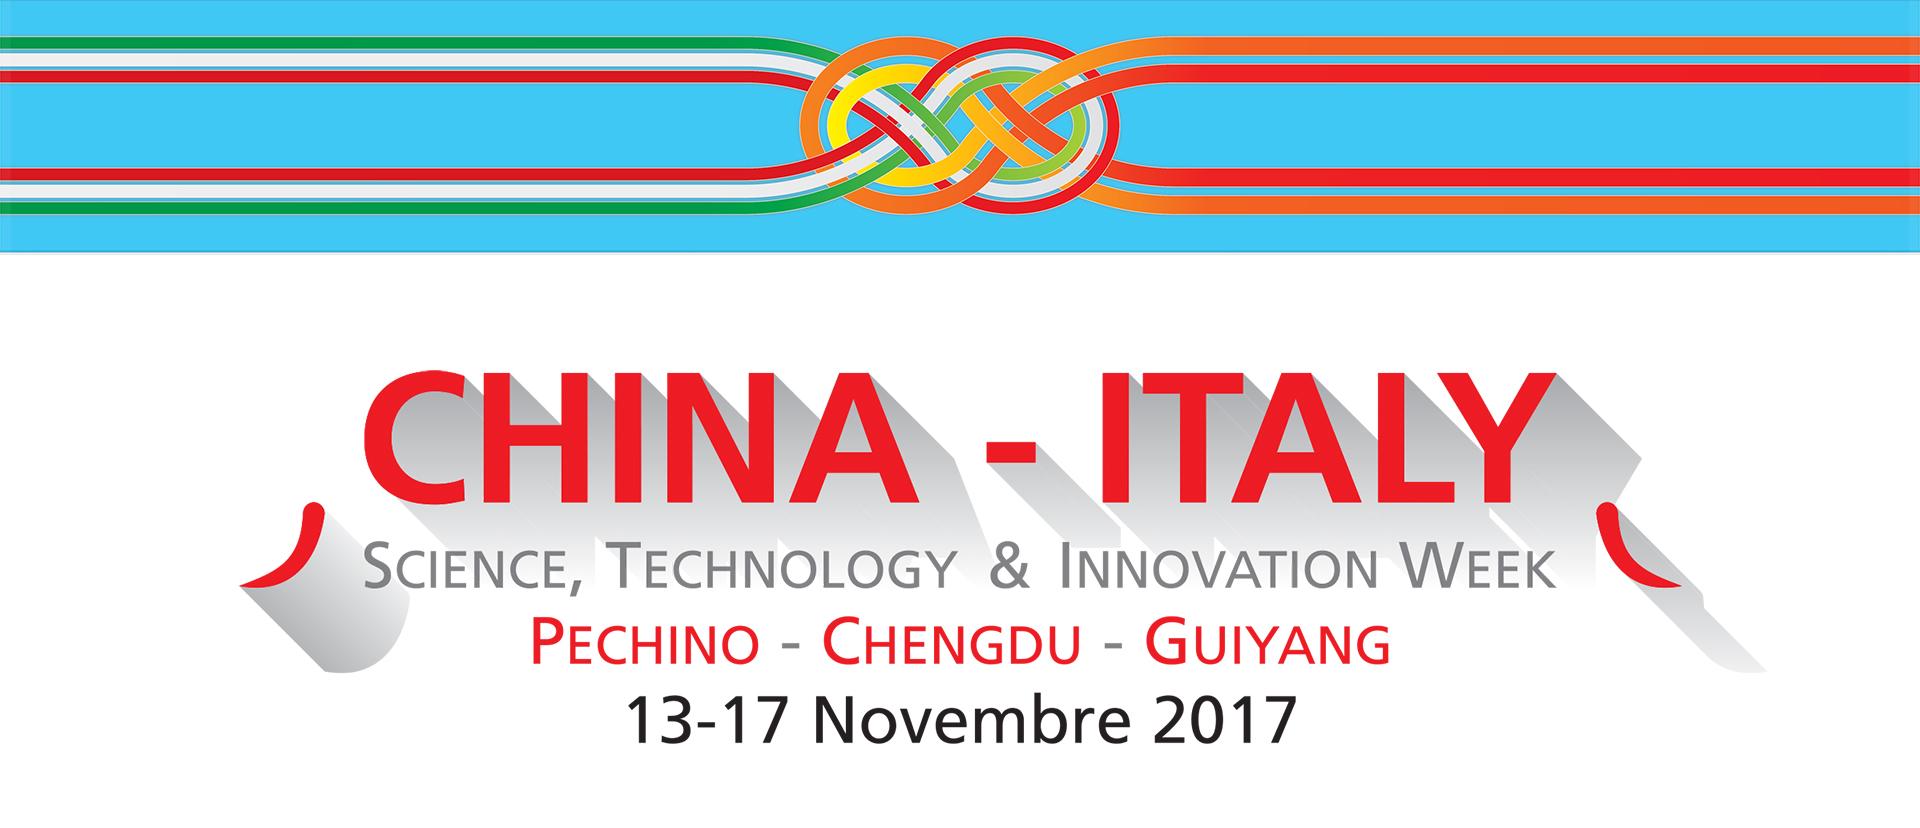 CHINA-ITALY-WEEK 2017